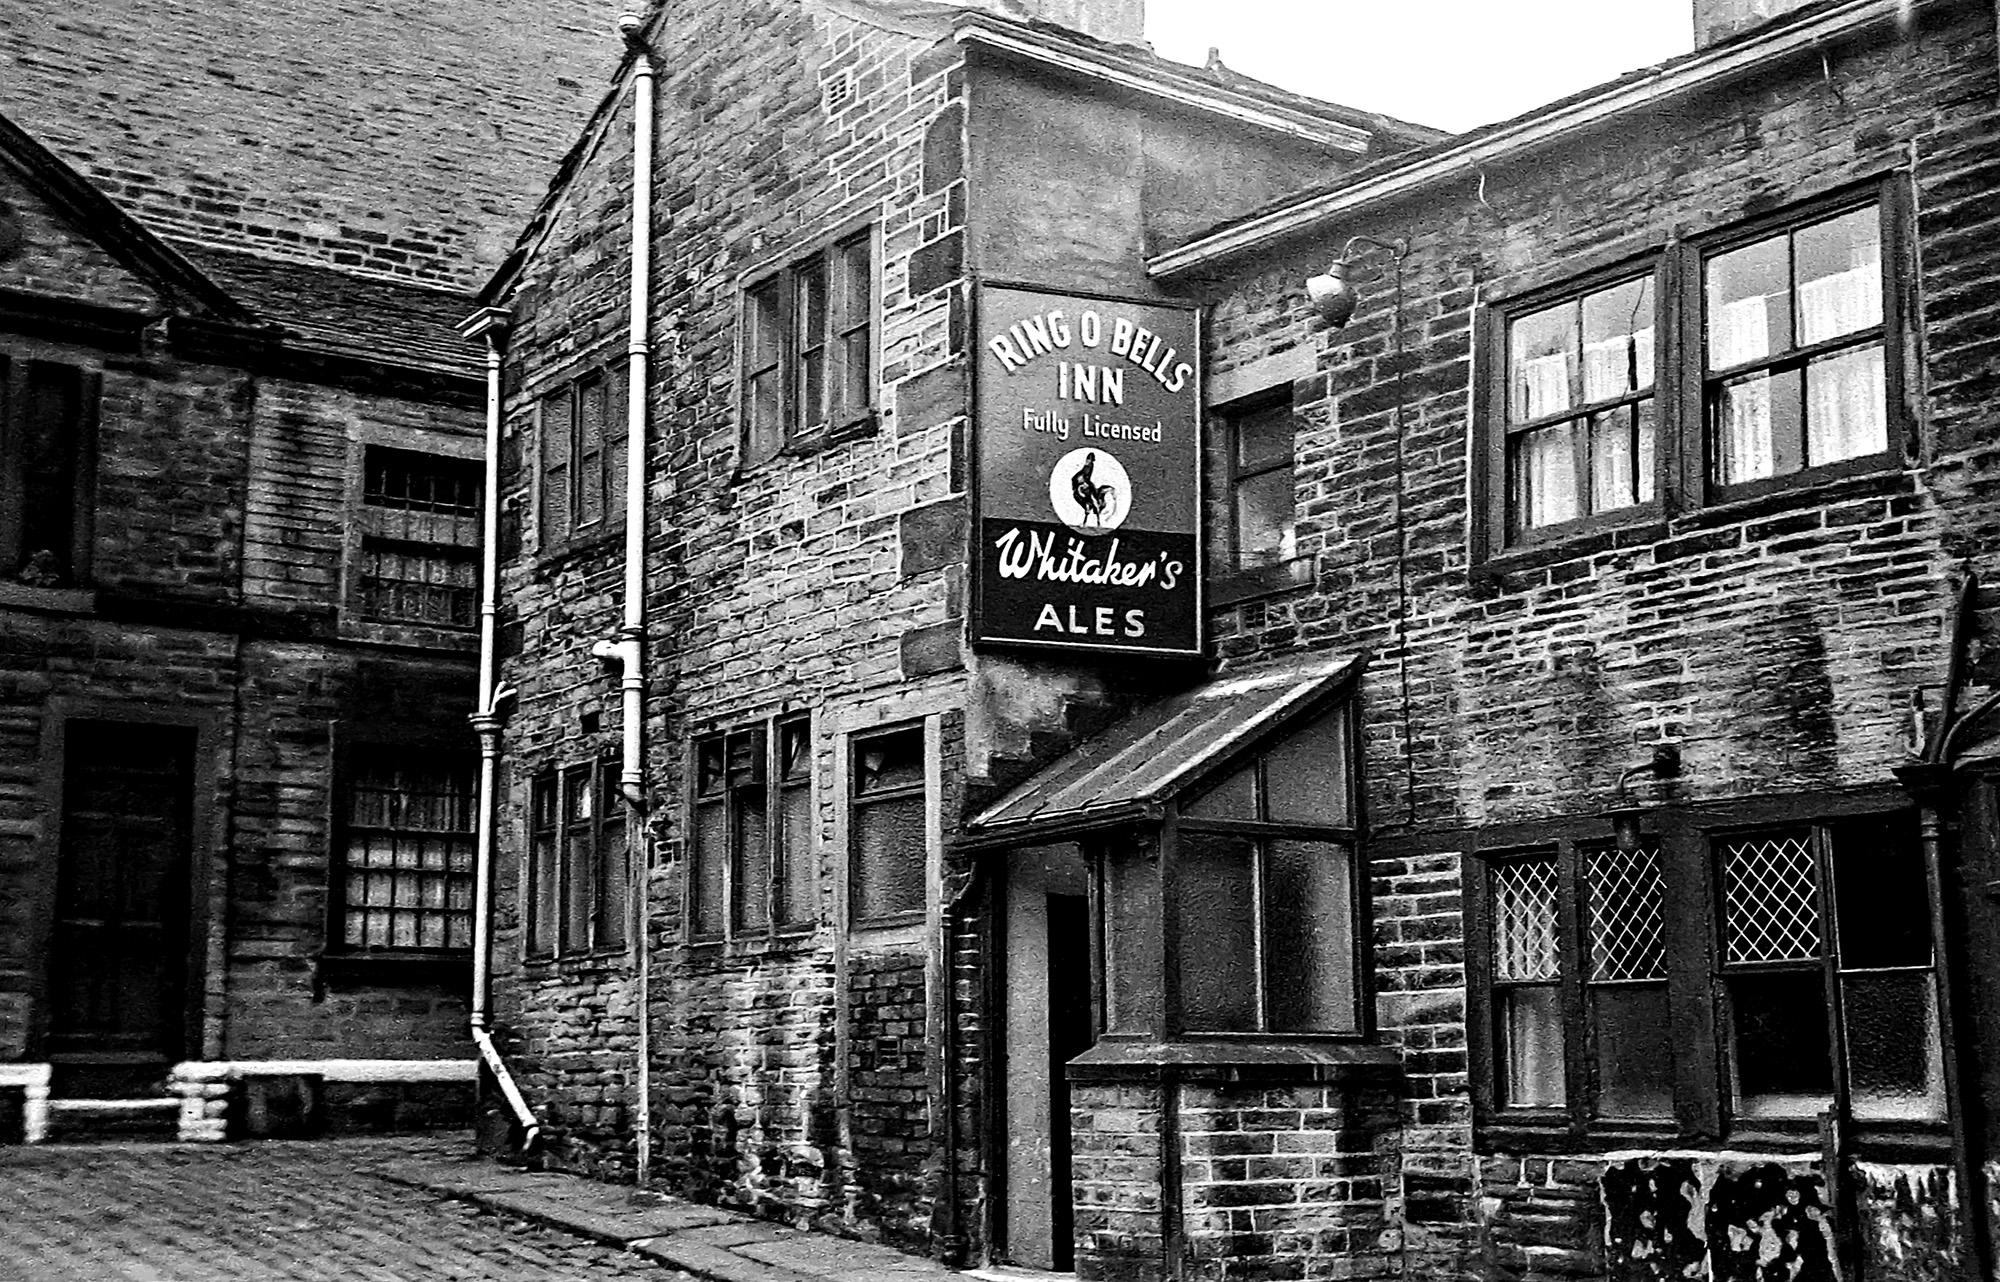 Ring O Bells Inn, Halifax